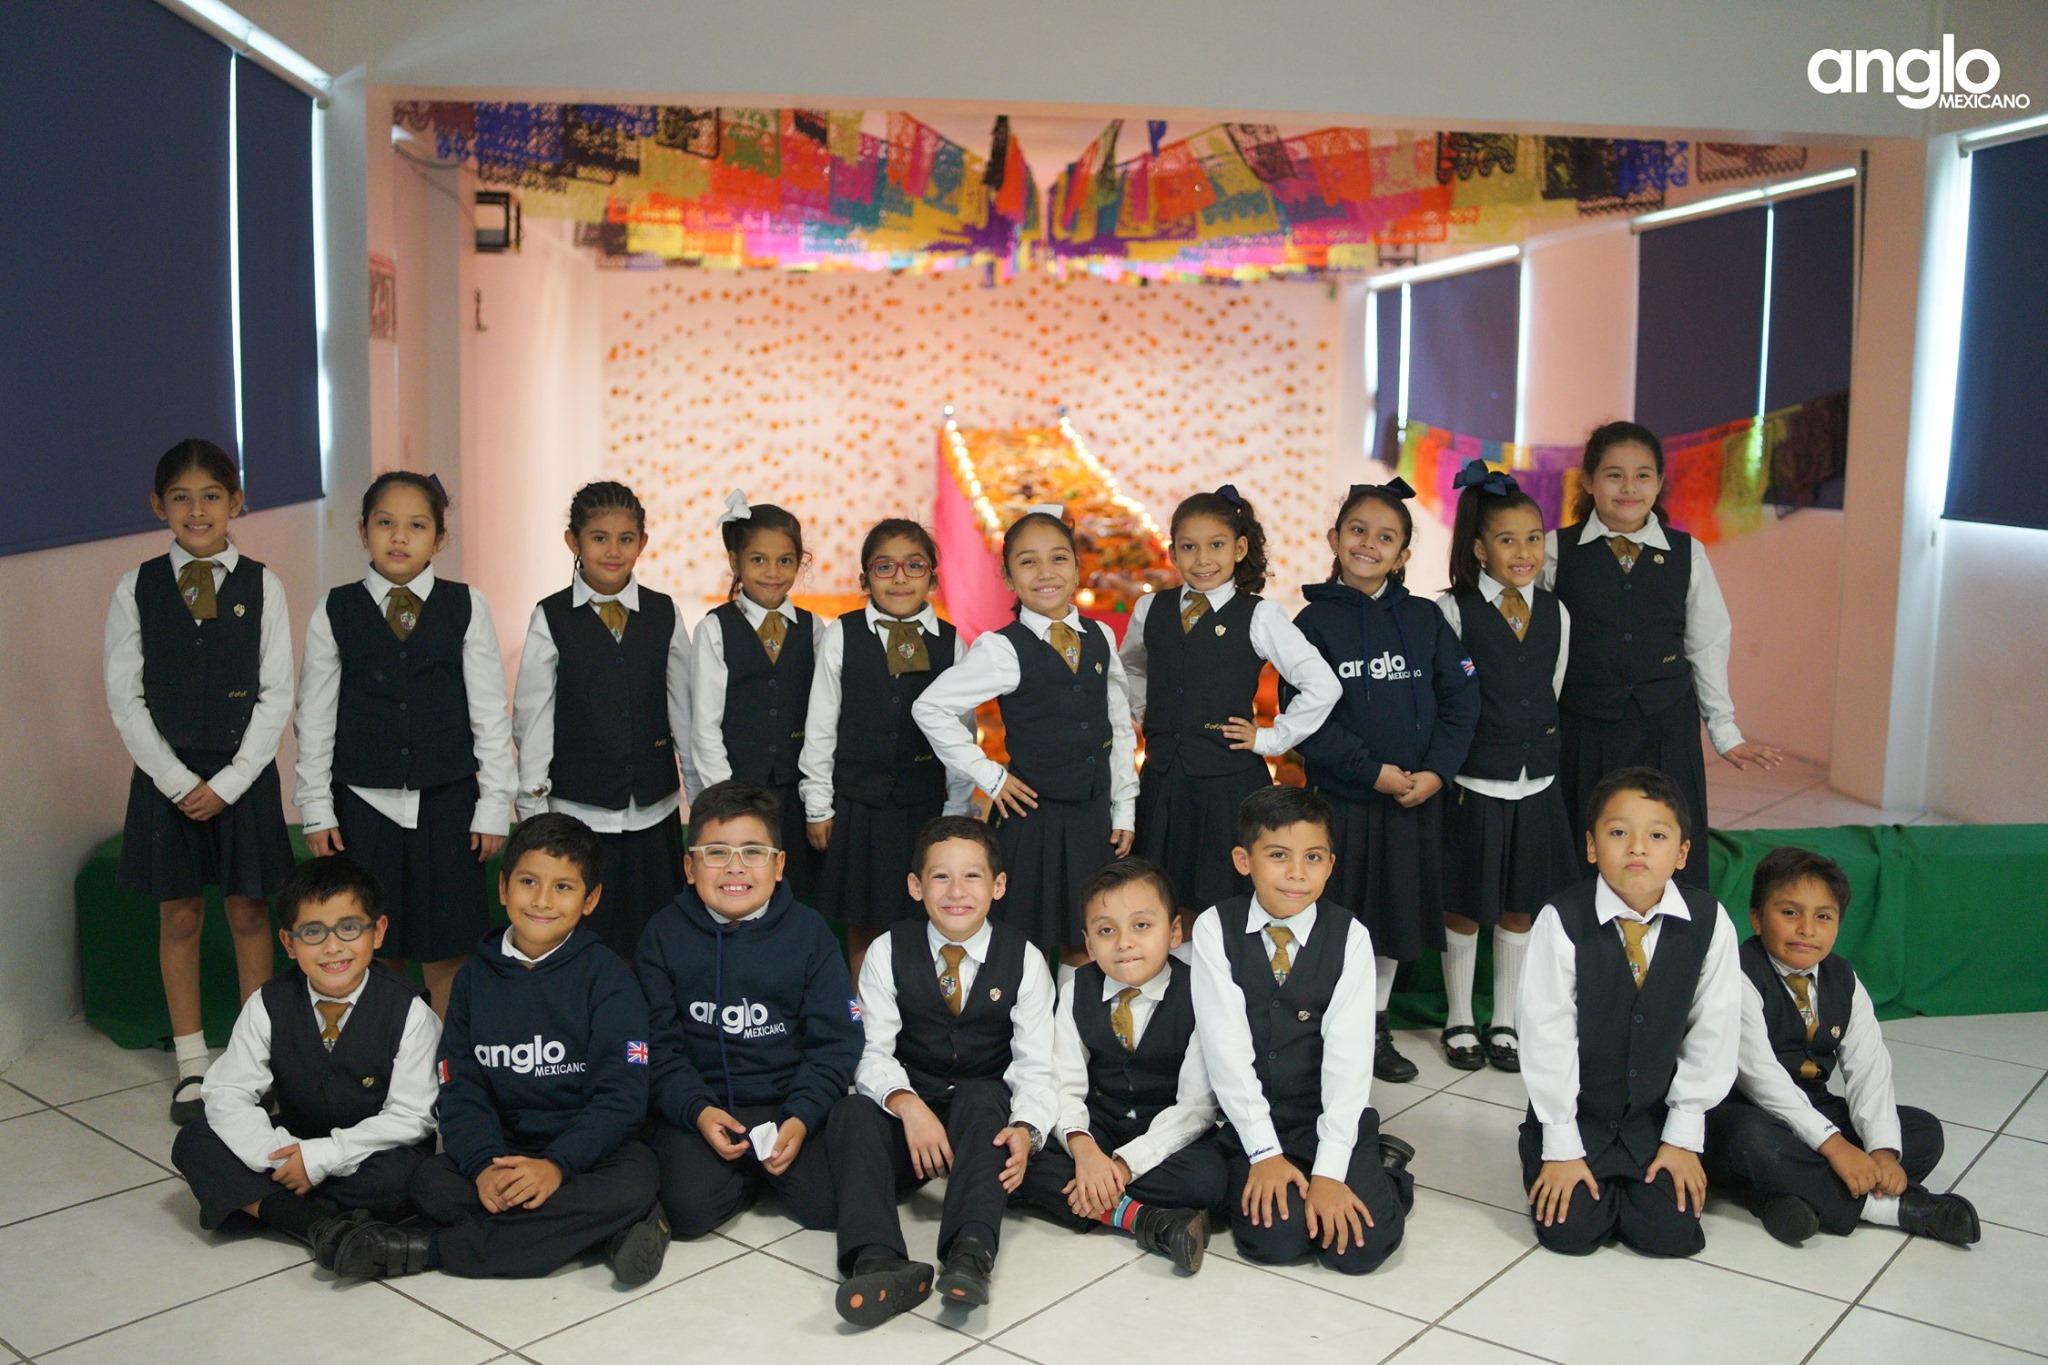 ANGLO MEXICANO DE COATZACOALCOS-VISITA-ALTARES-001